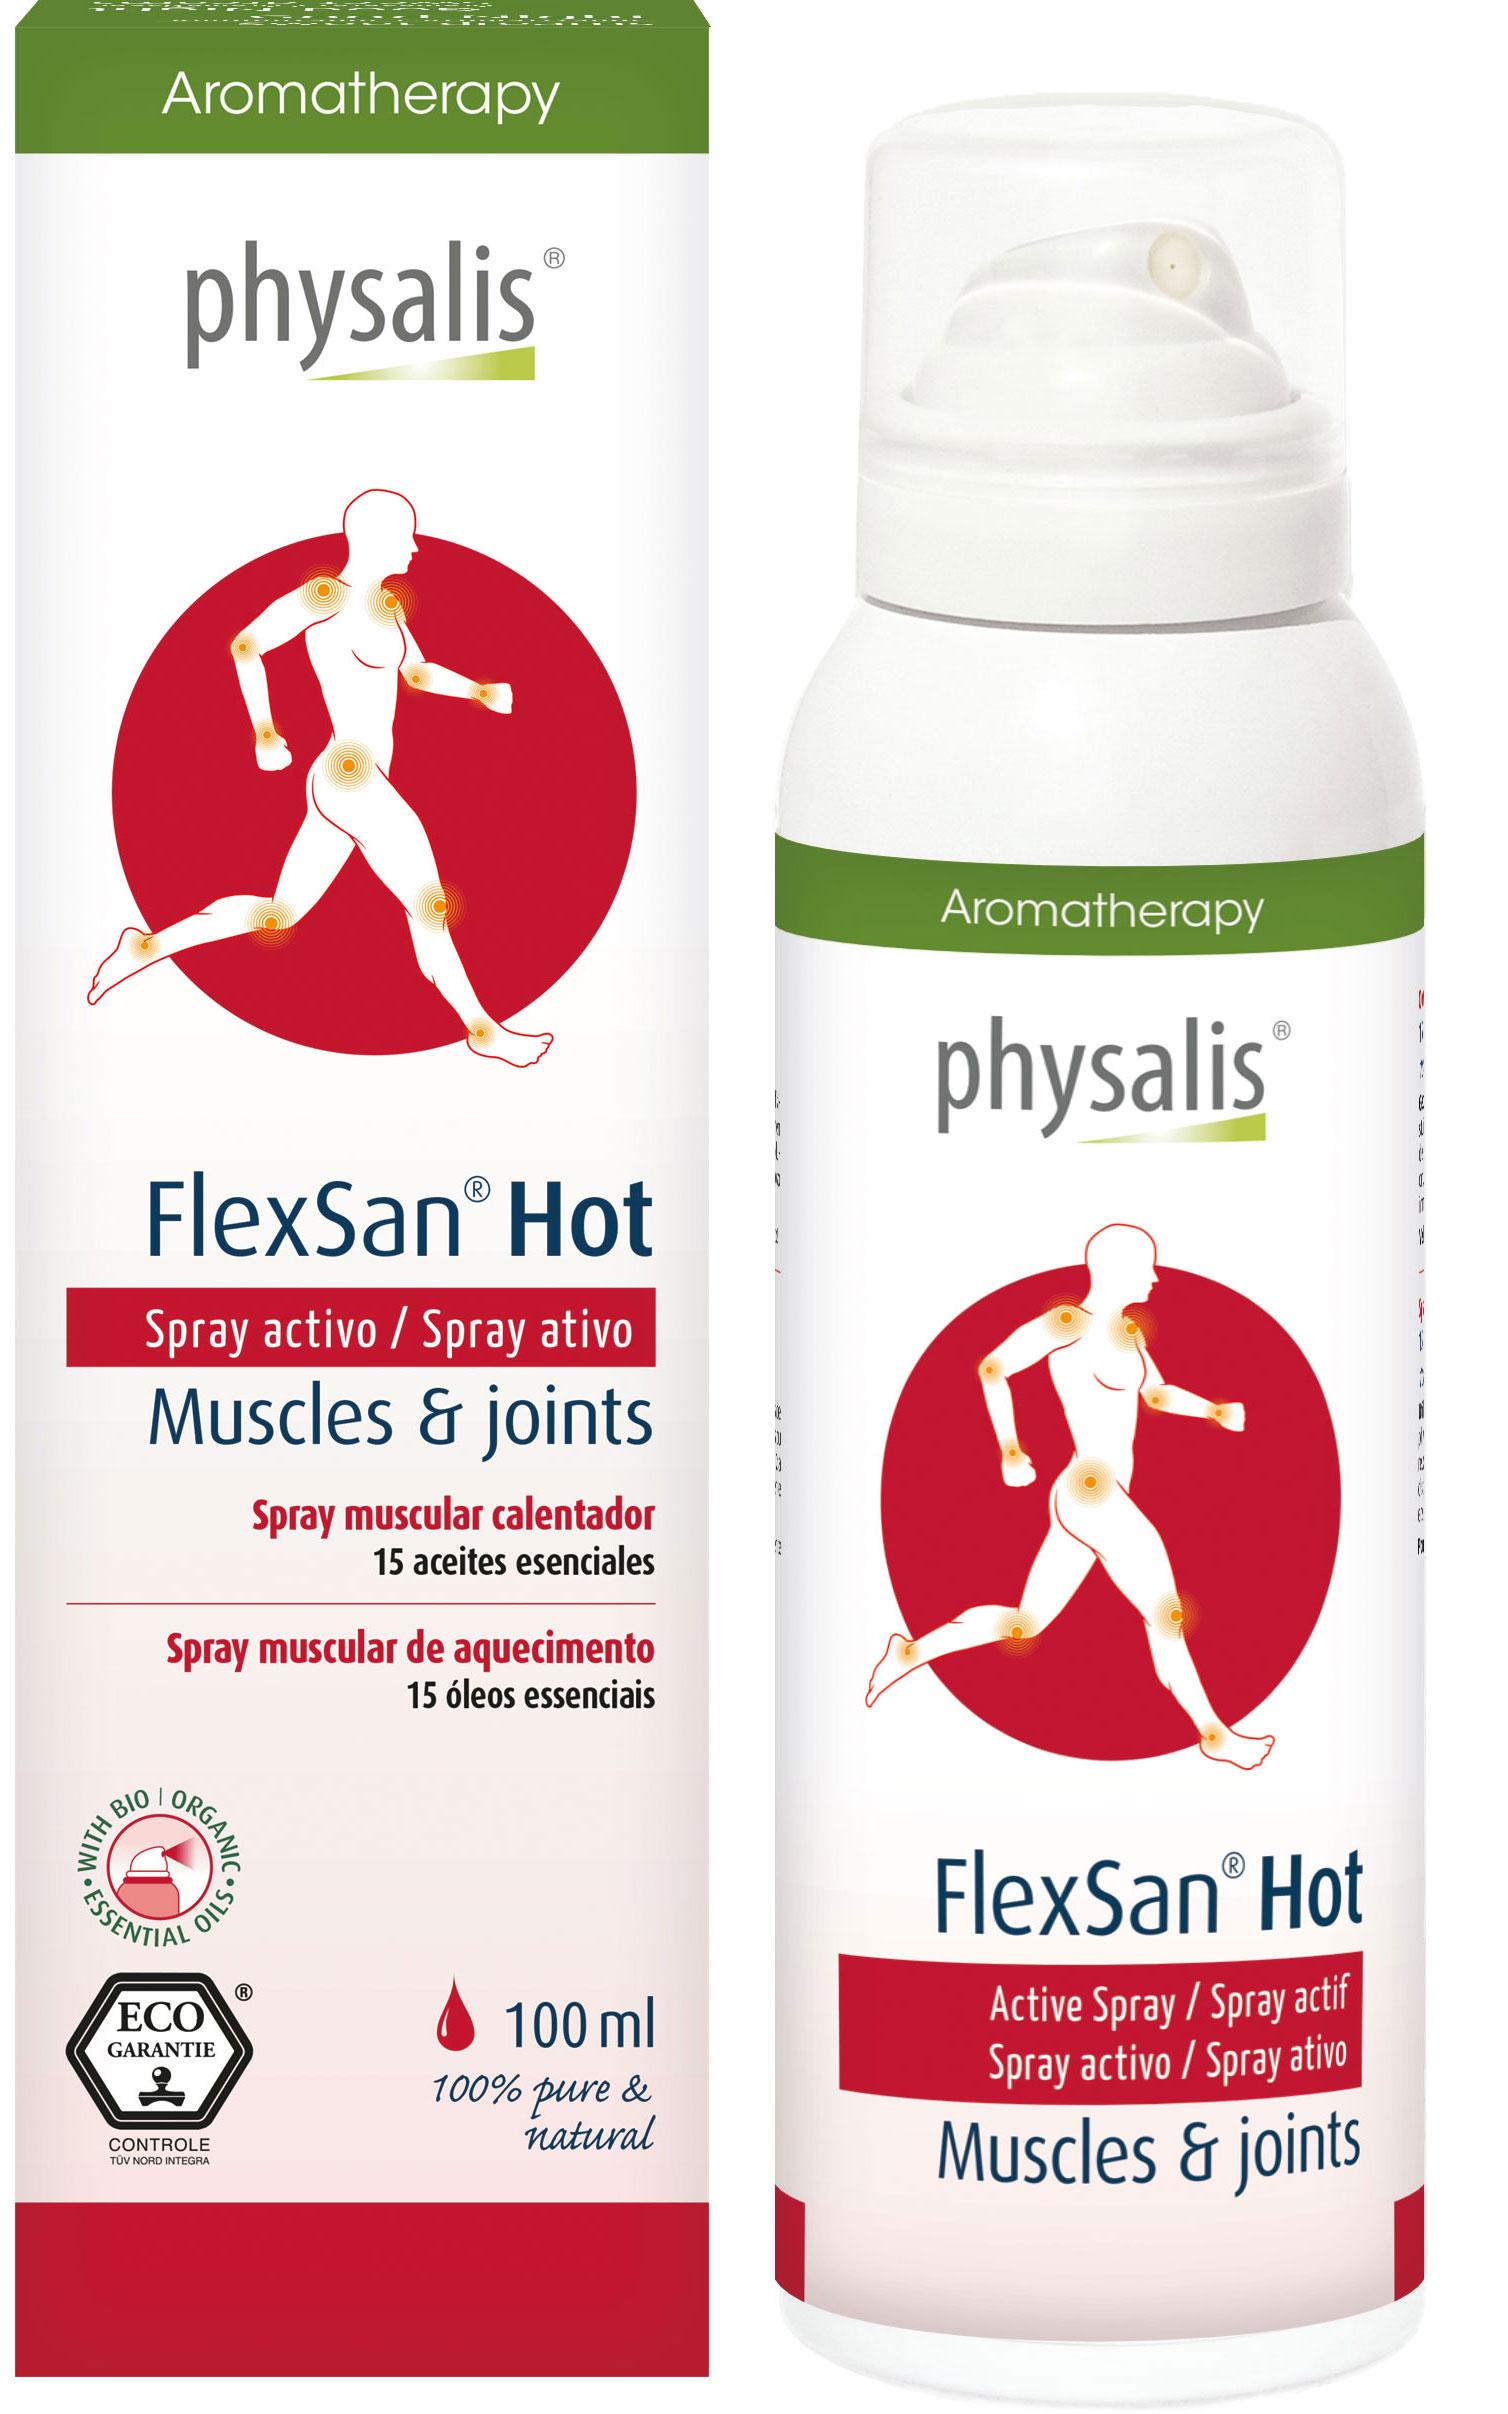 FlexSan<sup>®</sup> Hot